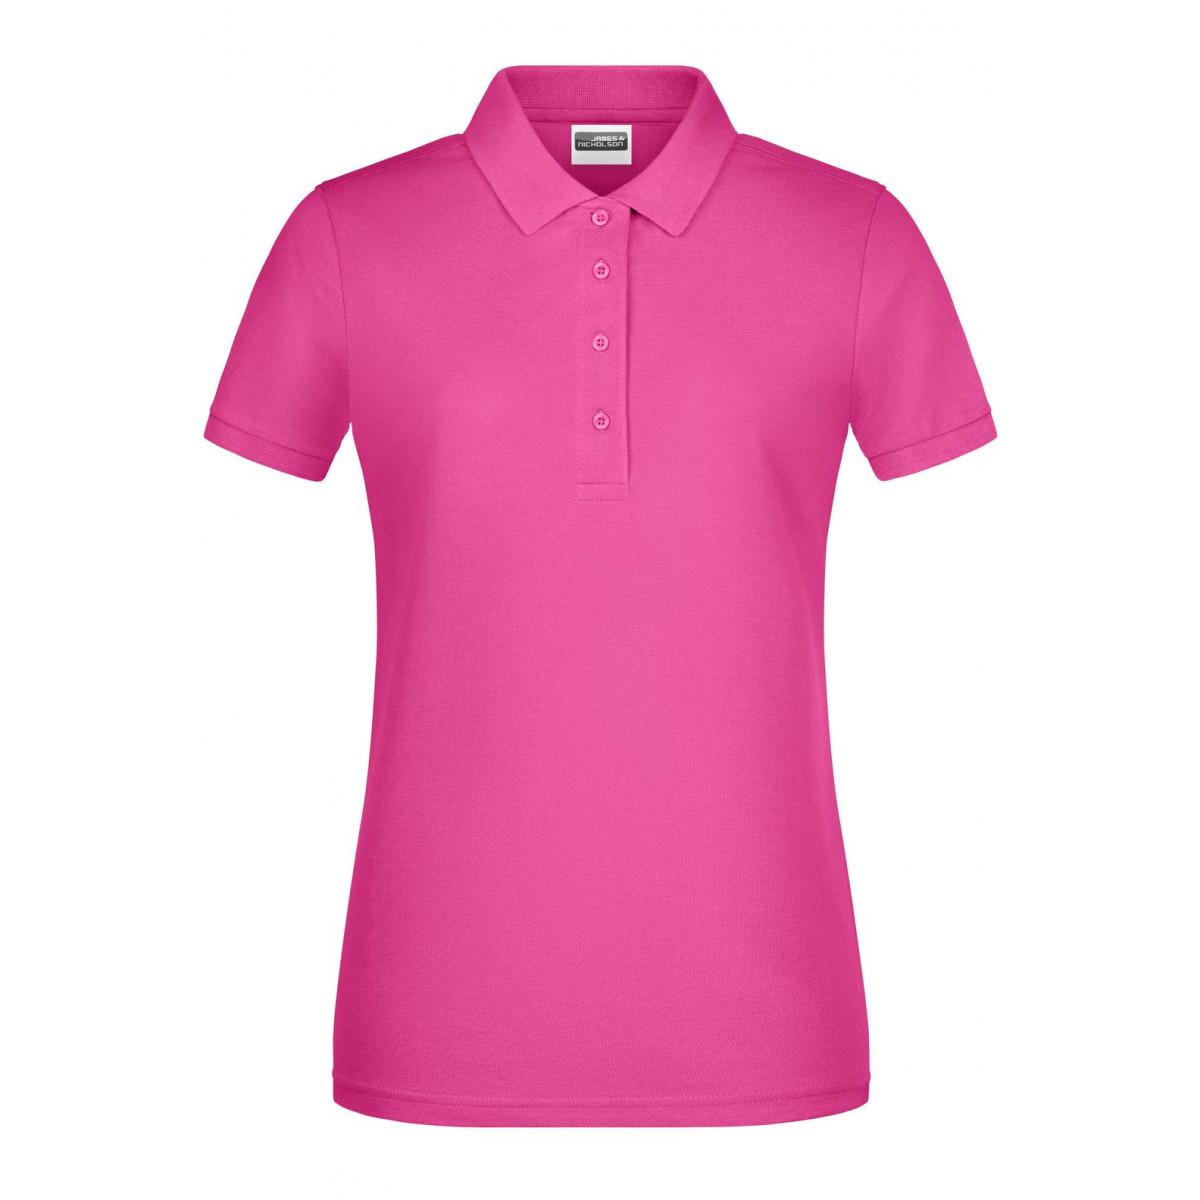 Рубашка поло женская 8009 Ladies Basic Polo - Розовый